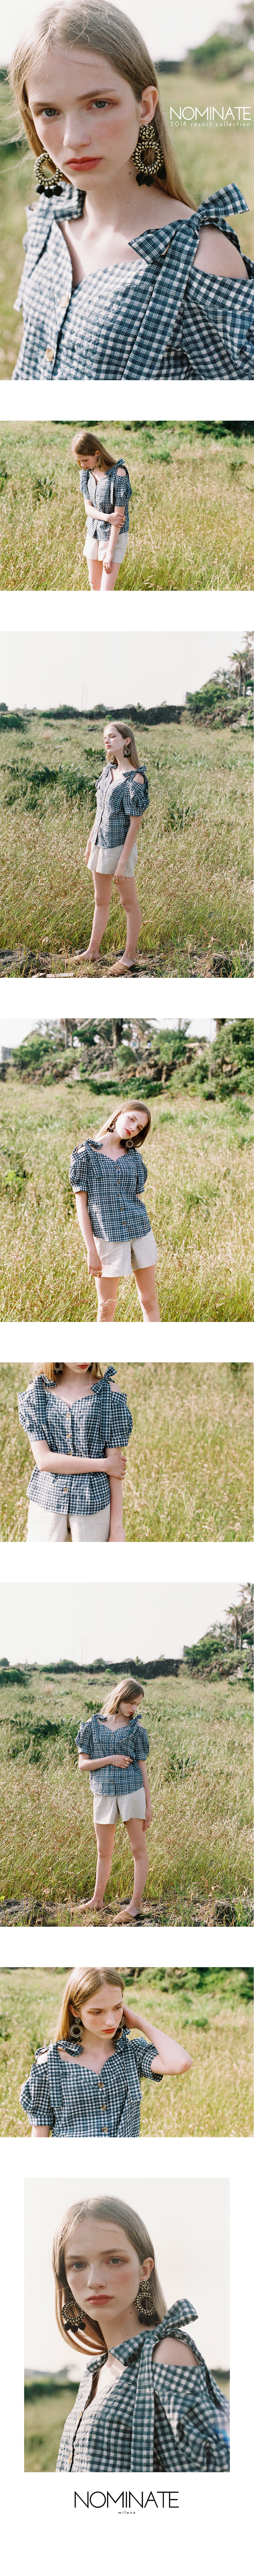 NOMINATE - Korean Fashion - #Kfashion - Off-Shoulder Puff Blouse Navy Check